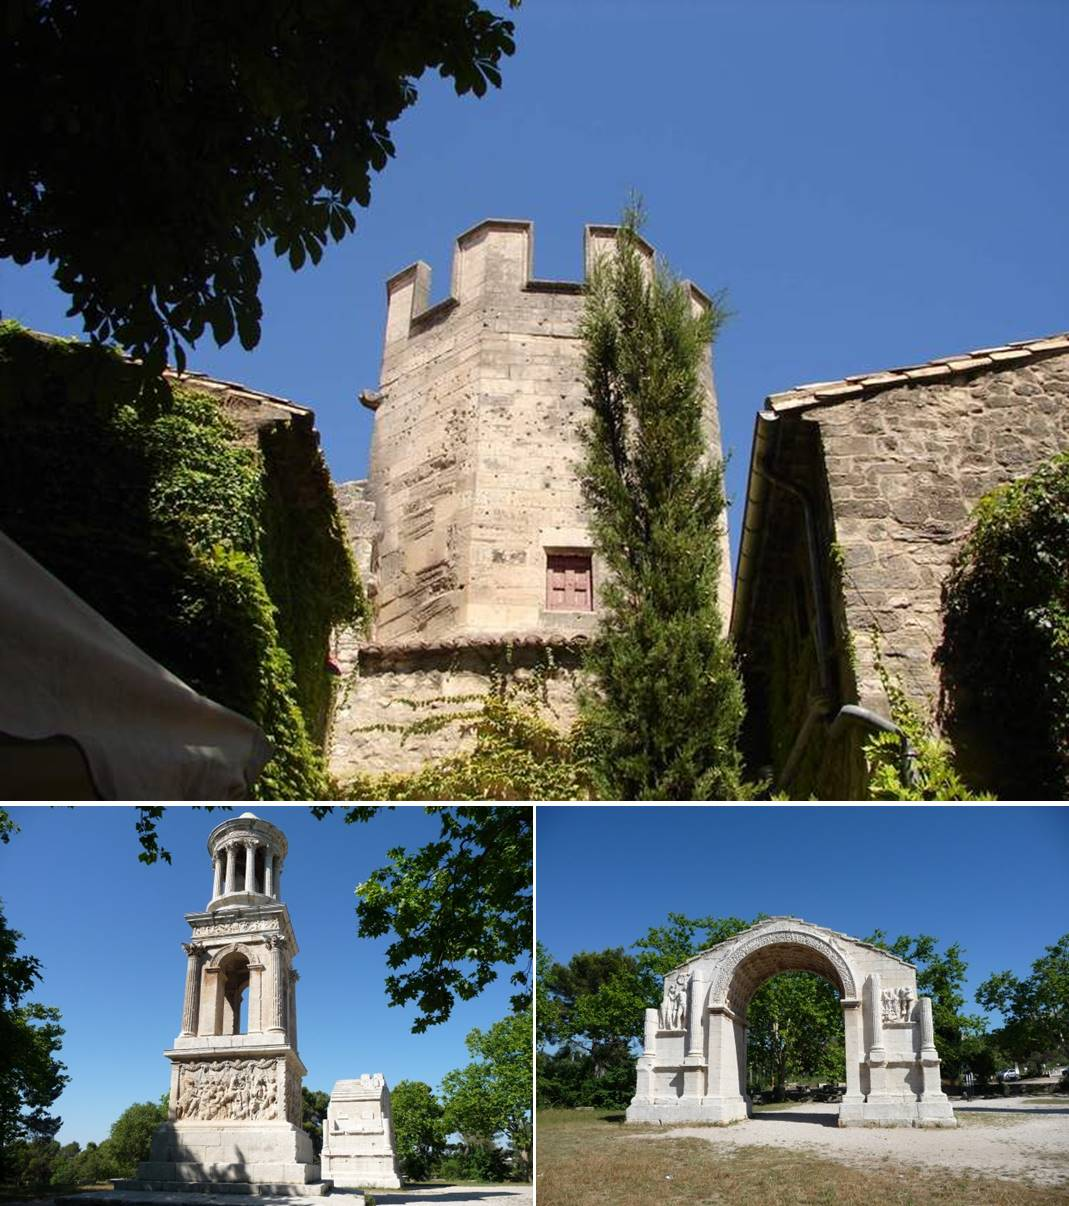 Saint-Remy